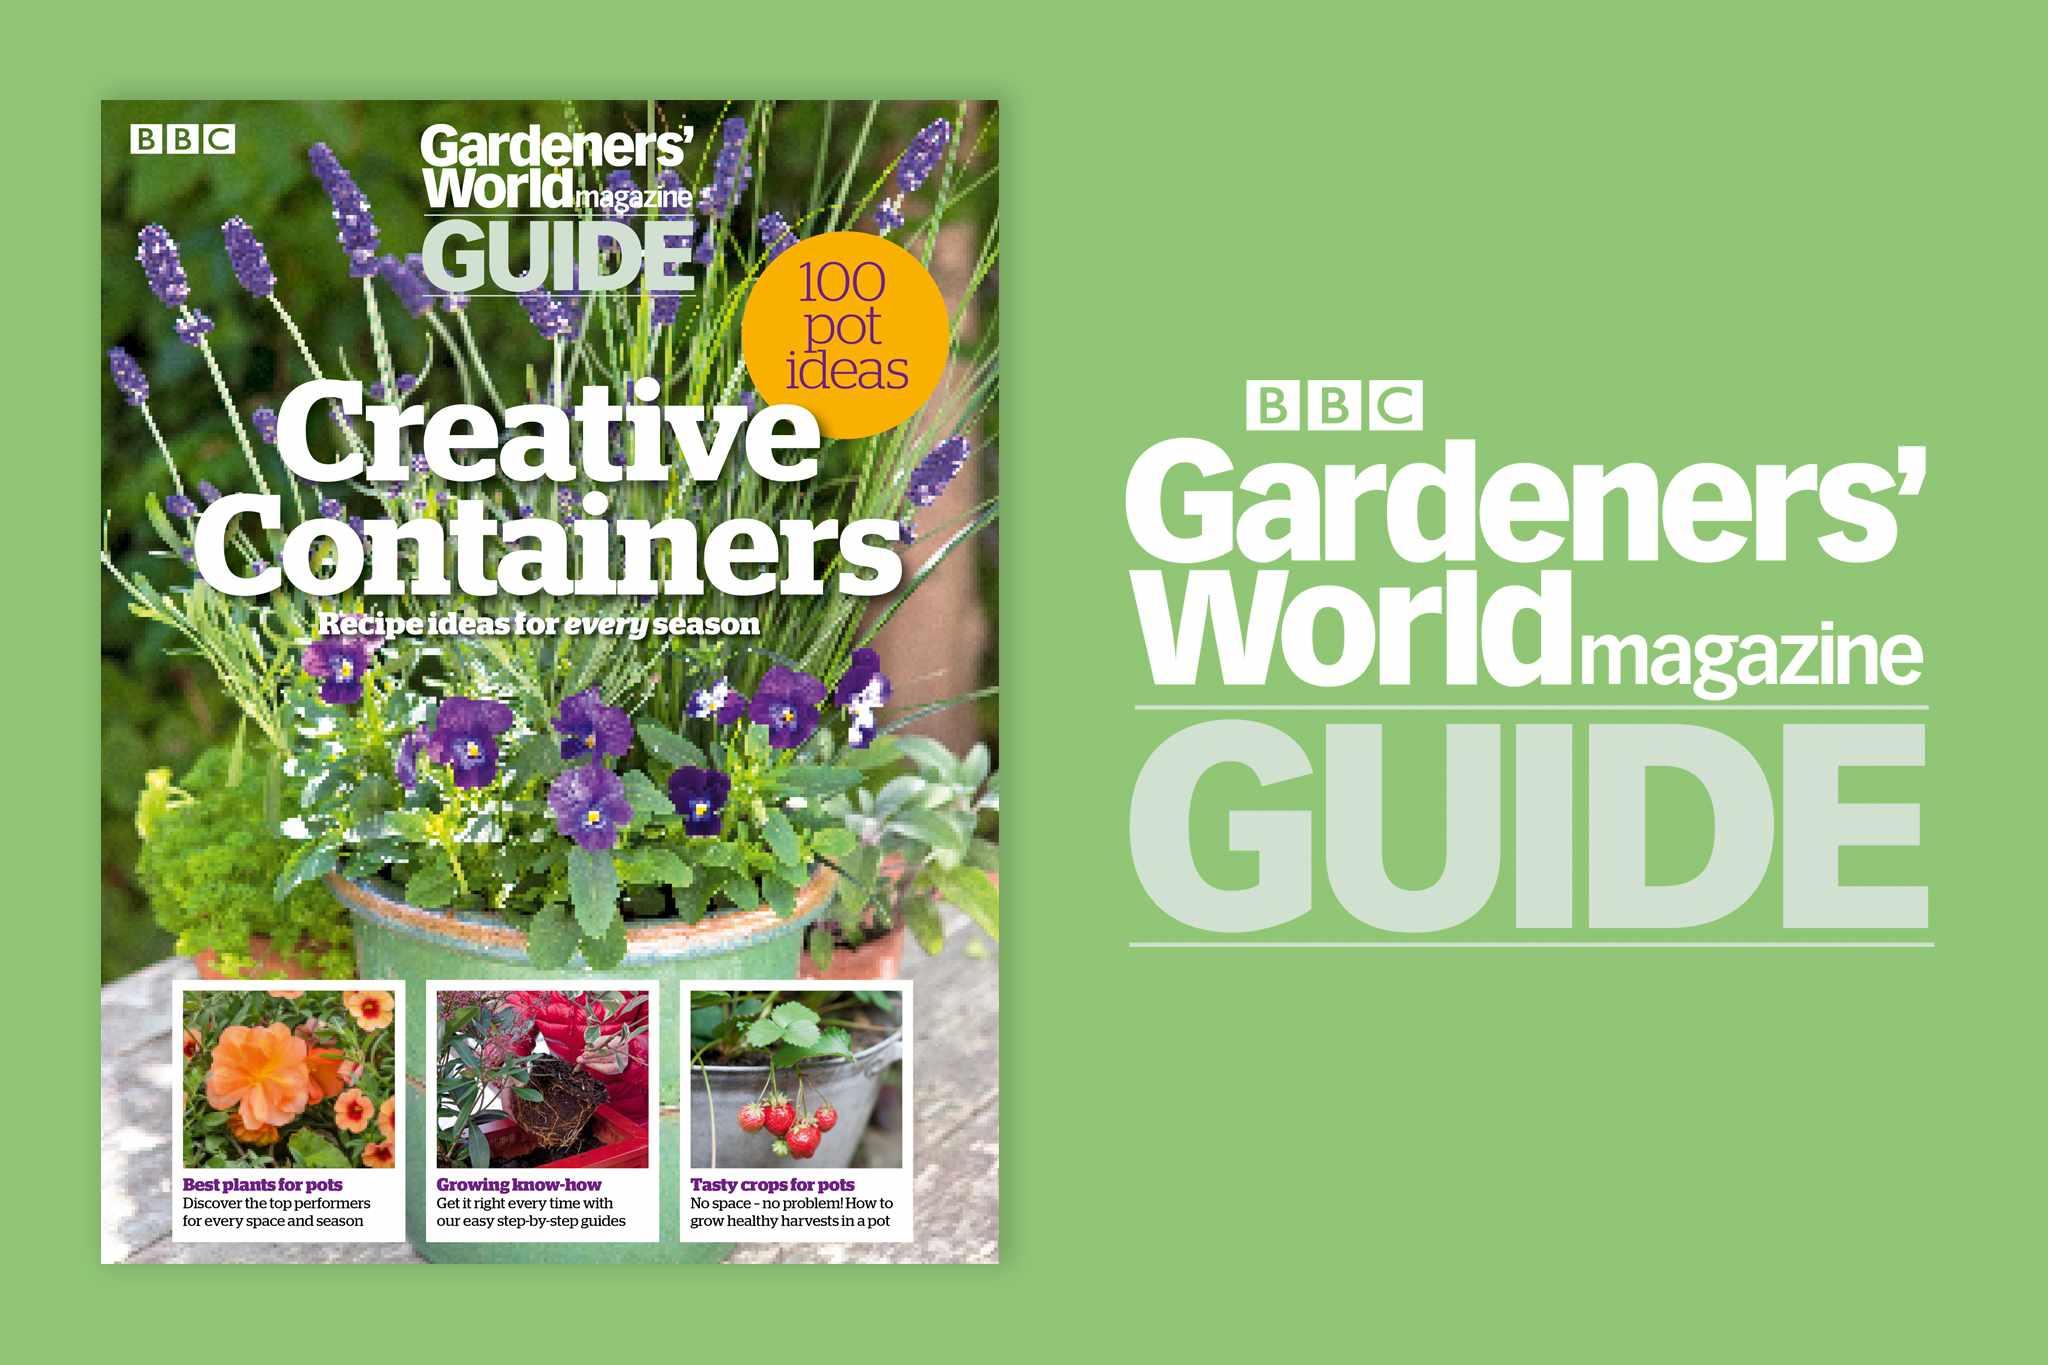 BBC Gardeners' World Magazine Guide: Creative Containers